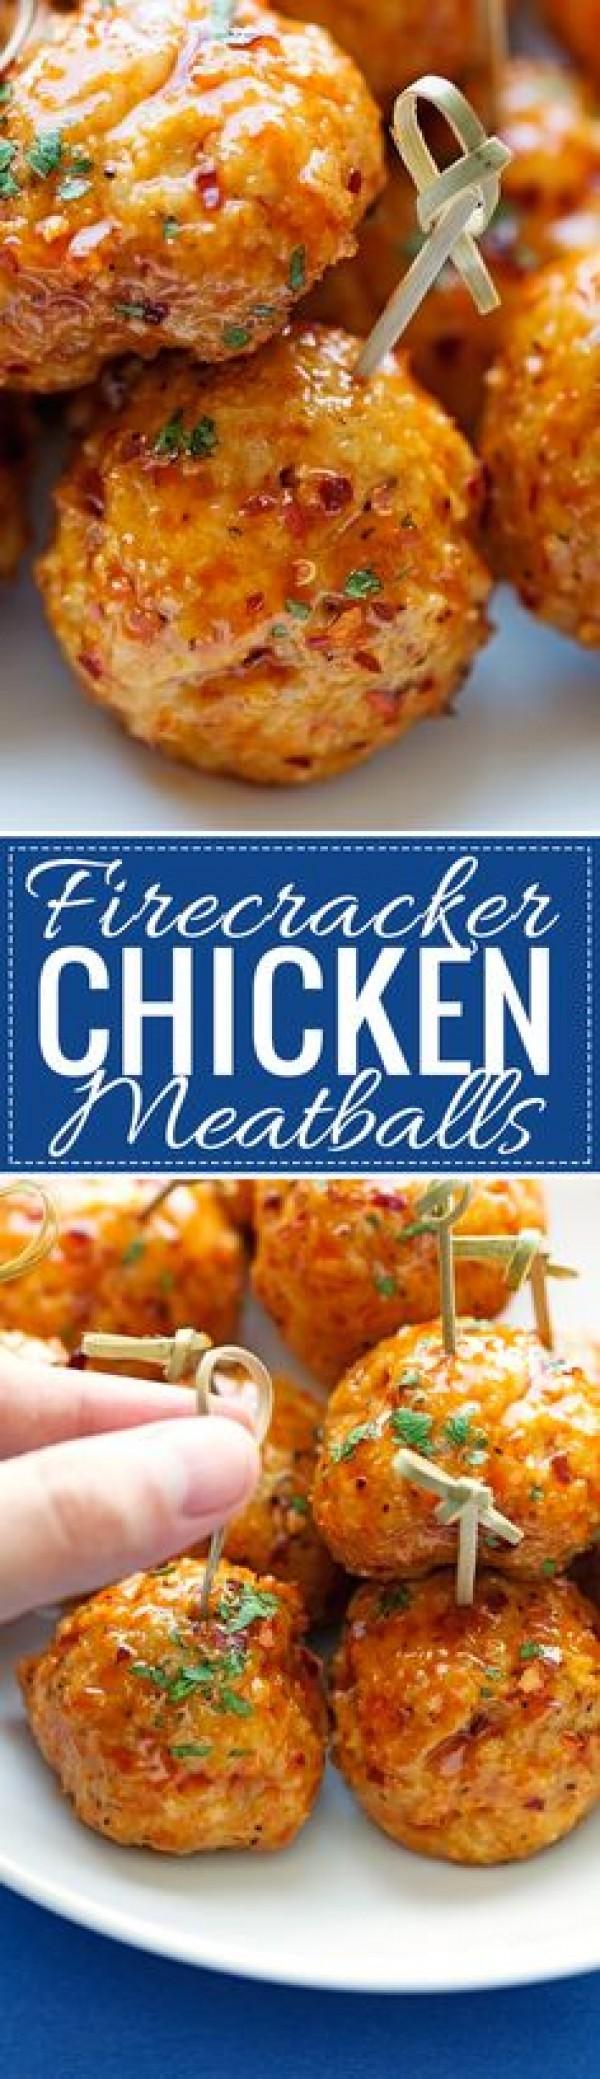 Get the recipe Firecracker Chicken Meatballs @recipes_to_go